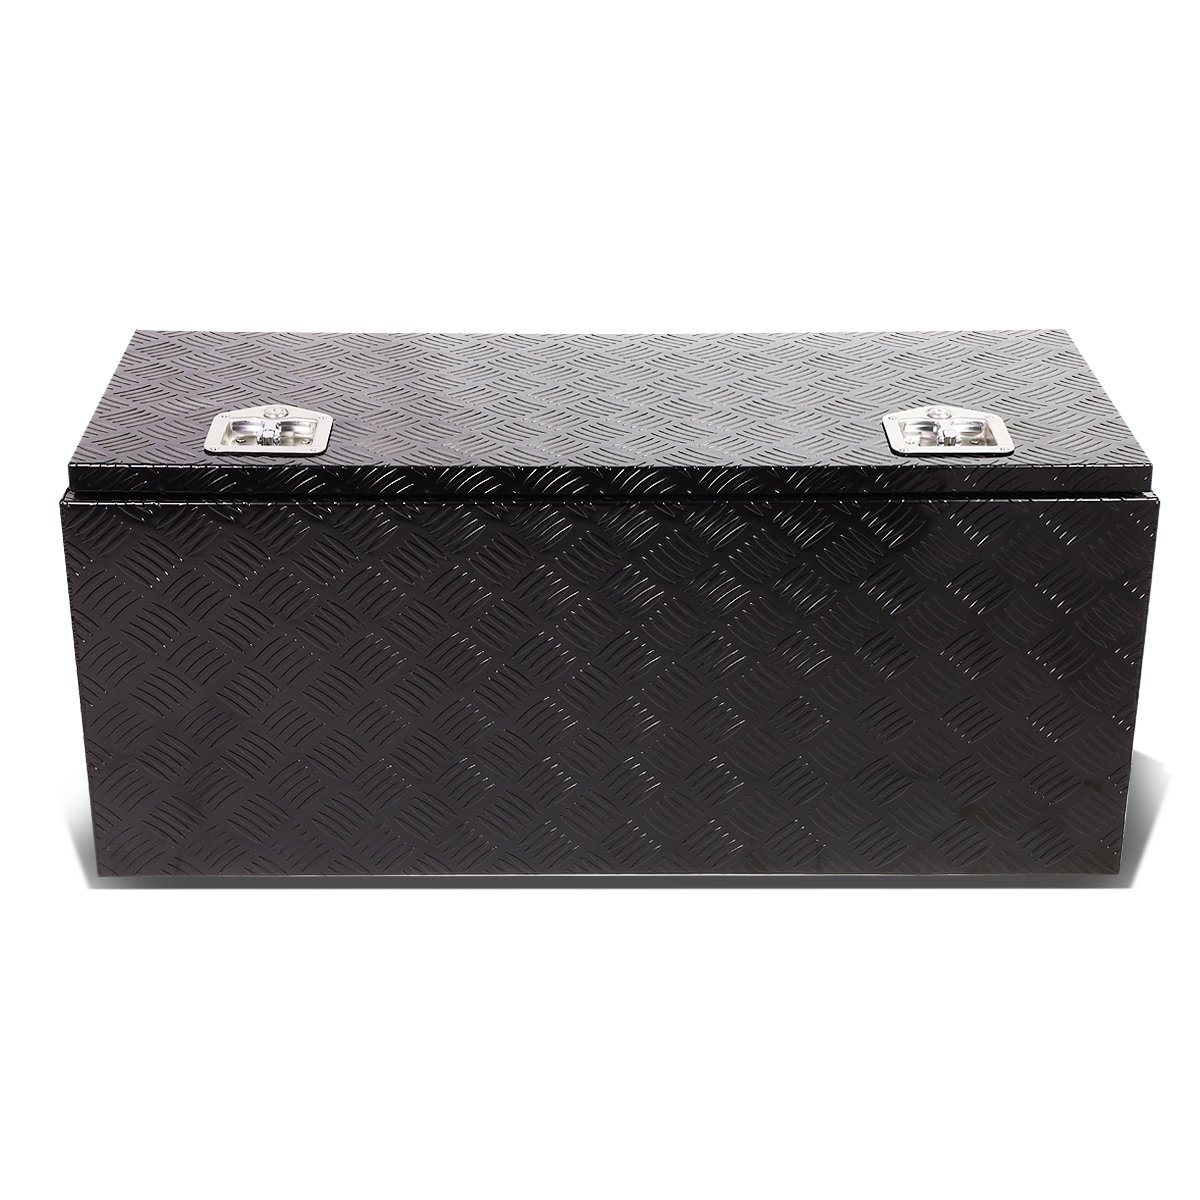 DNA Motoring TBOX-T2-36-ALU-BK 36''x18''x16'' Aluminum Truck Tool Box with Lock & Keys (Black)